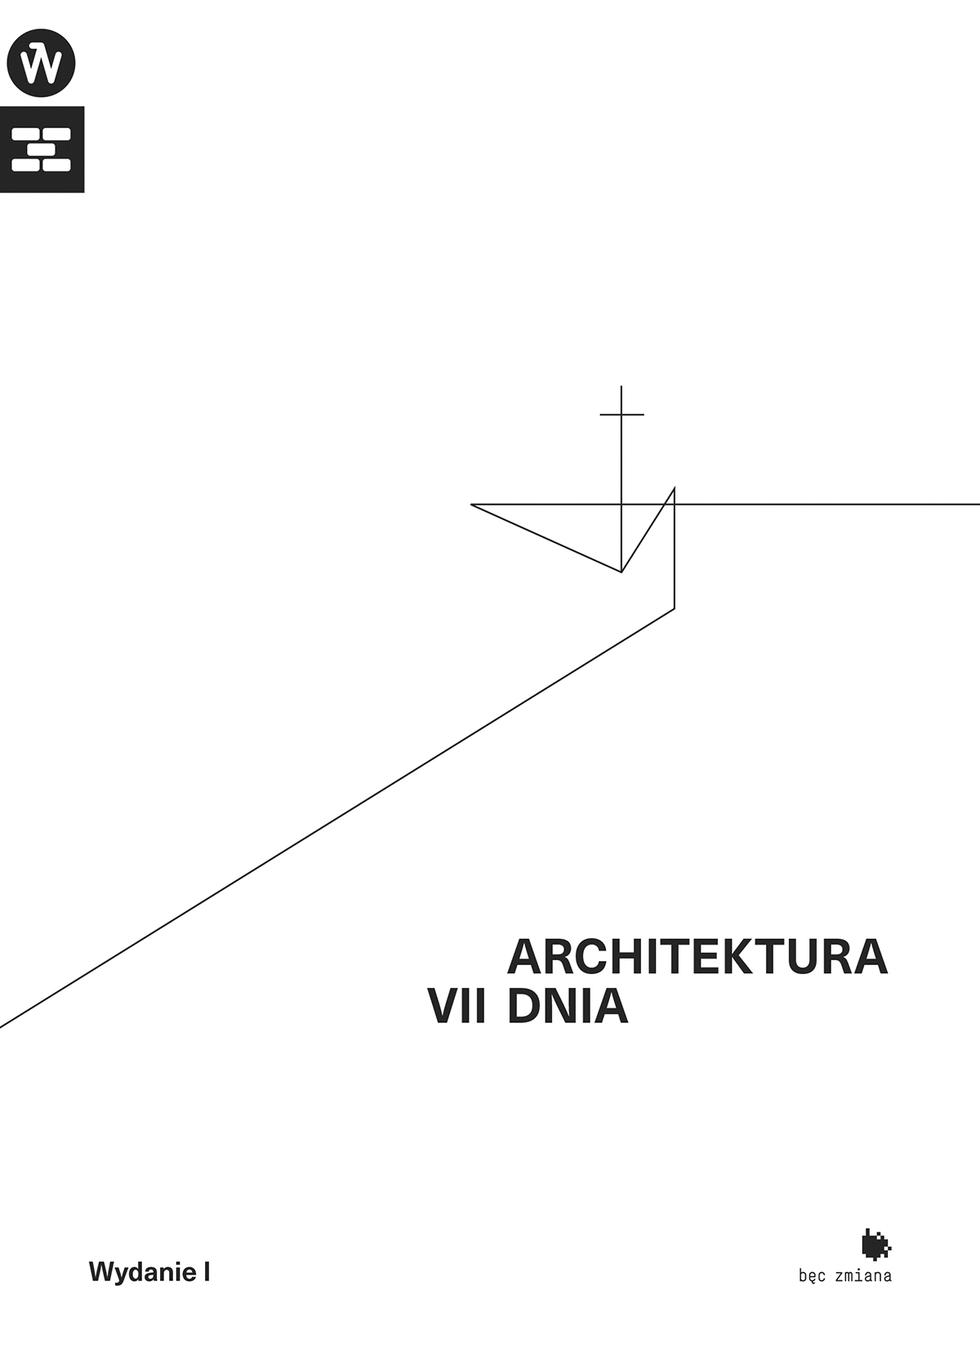 Architektura VII dnia